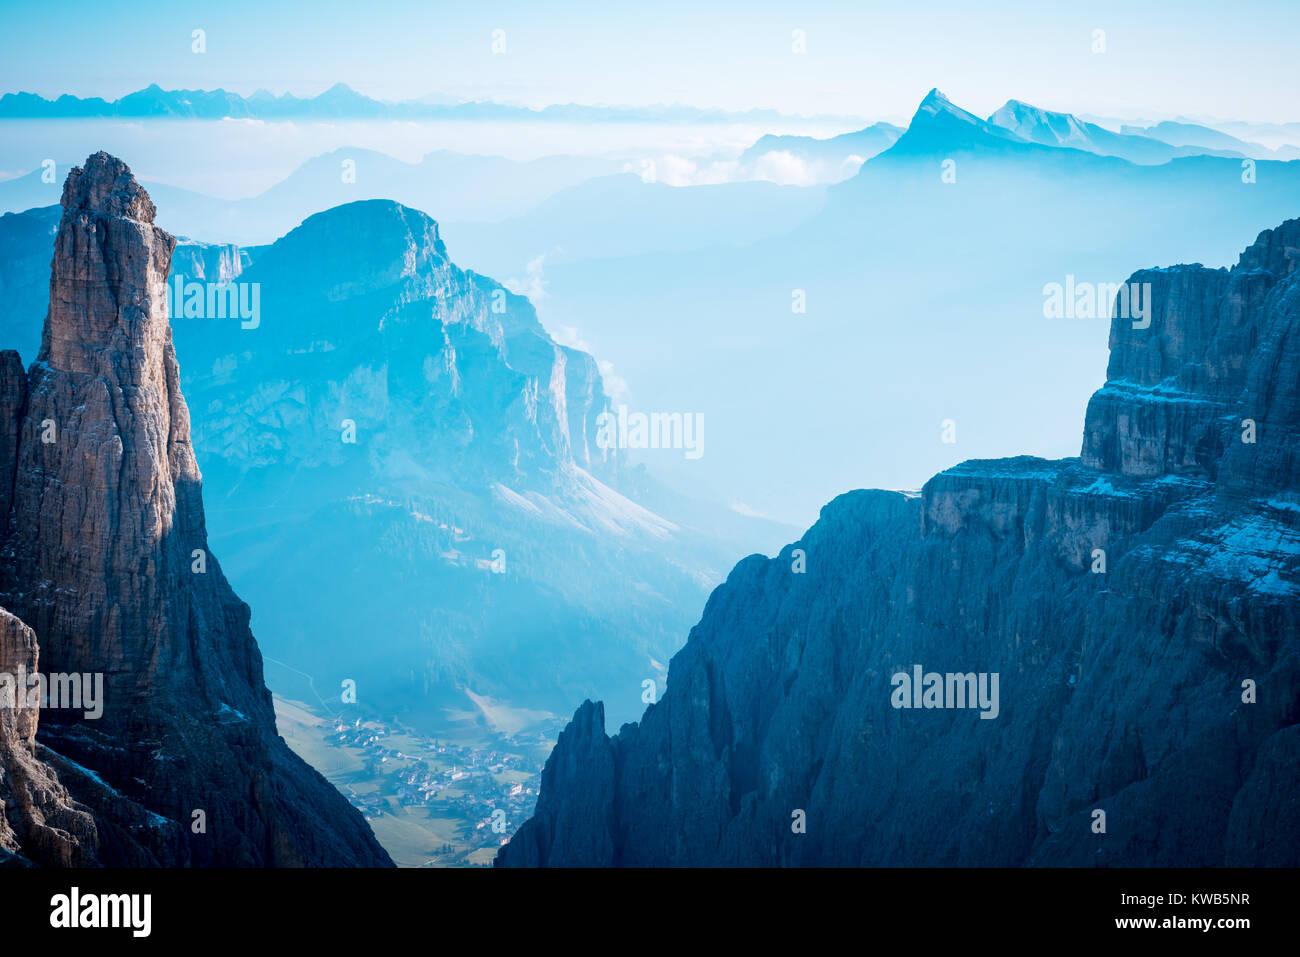 mountains Sella Ronda Dolomites Italy - Stock Image